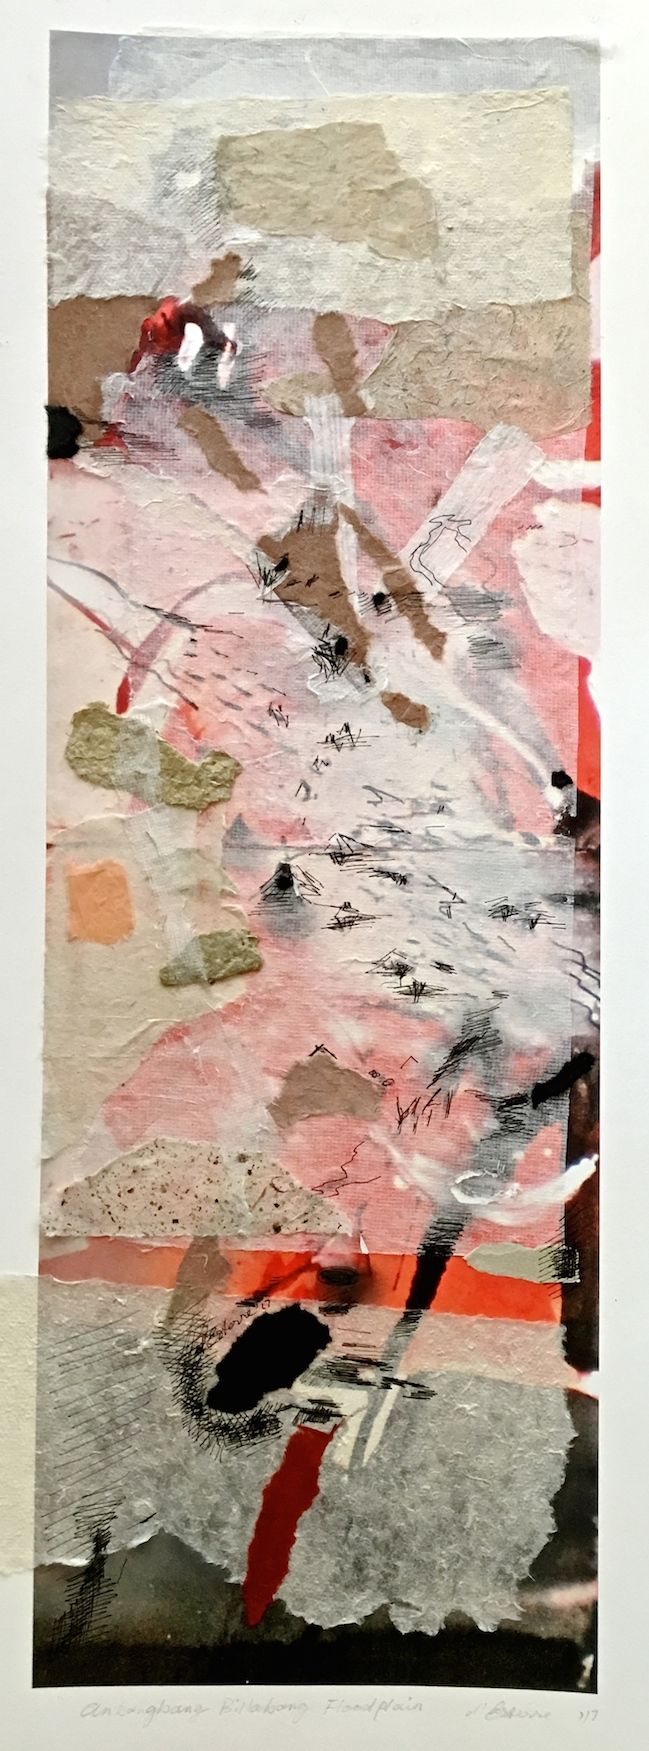 Elaine d'Esterre - Anbangbang Billabong Flood Plain, 2017, digital print and collage, 75x25 cm. Also ART BLOG at http://elainedesterreart.com/ and http://www.facebook.com/elainedesterreart/ and http://instagram.com/desterreart/